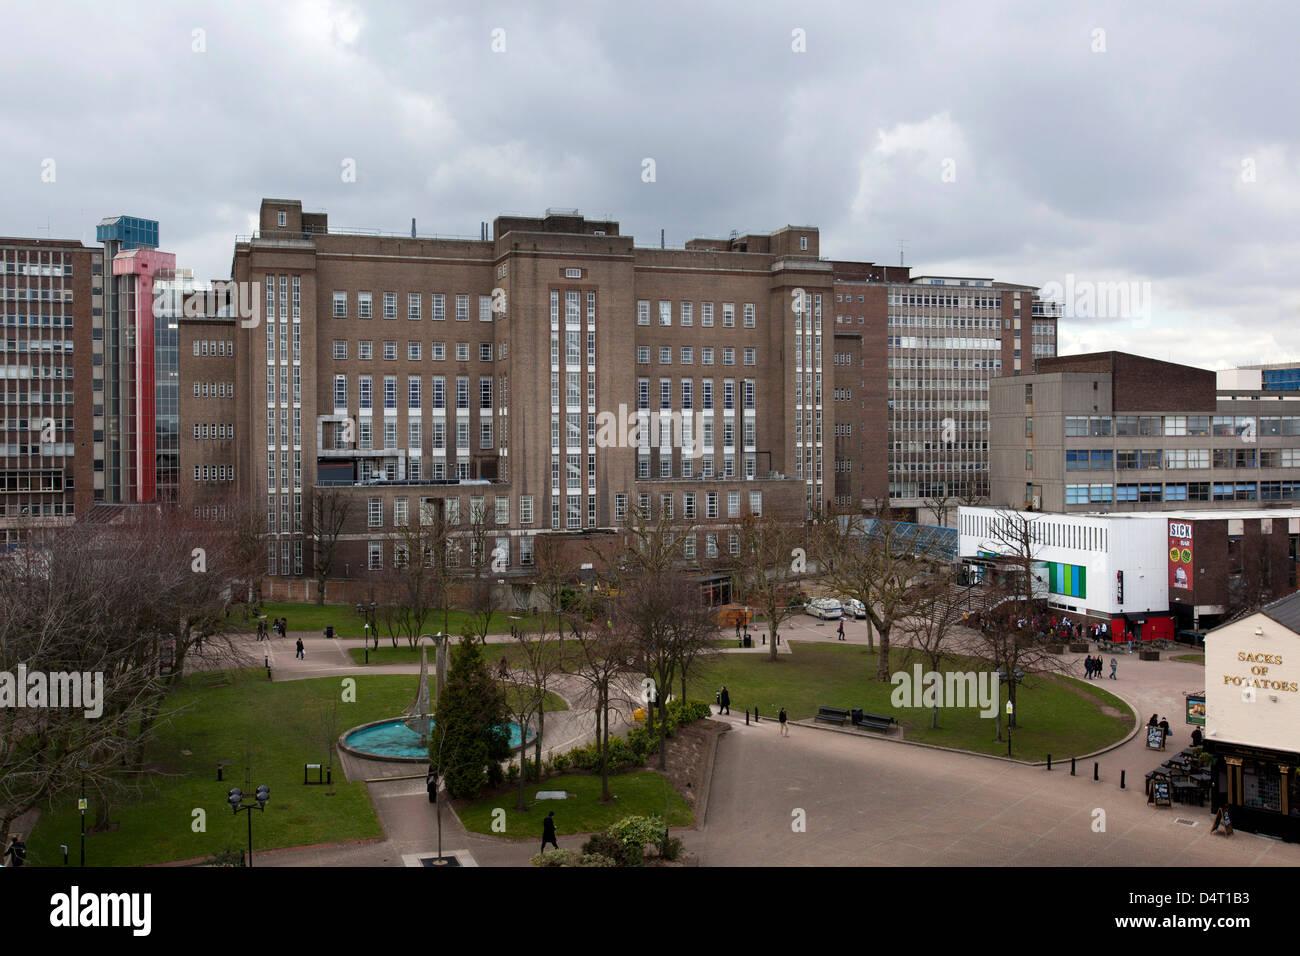 Aston University Main Building